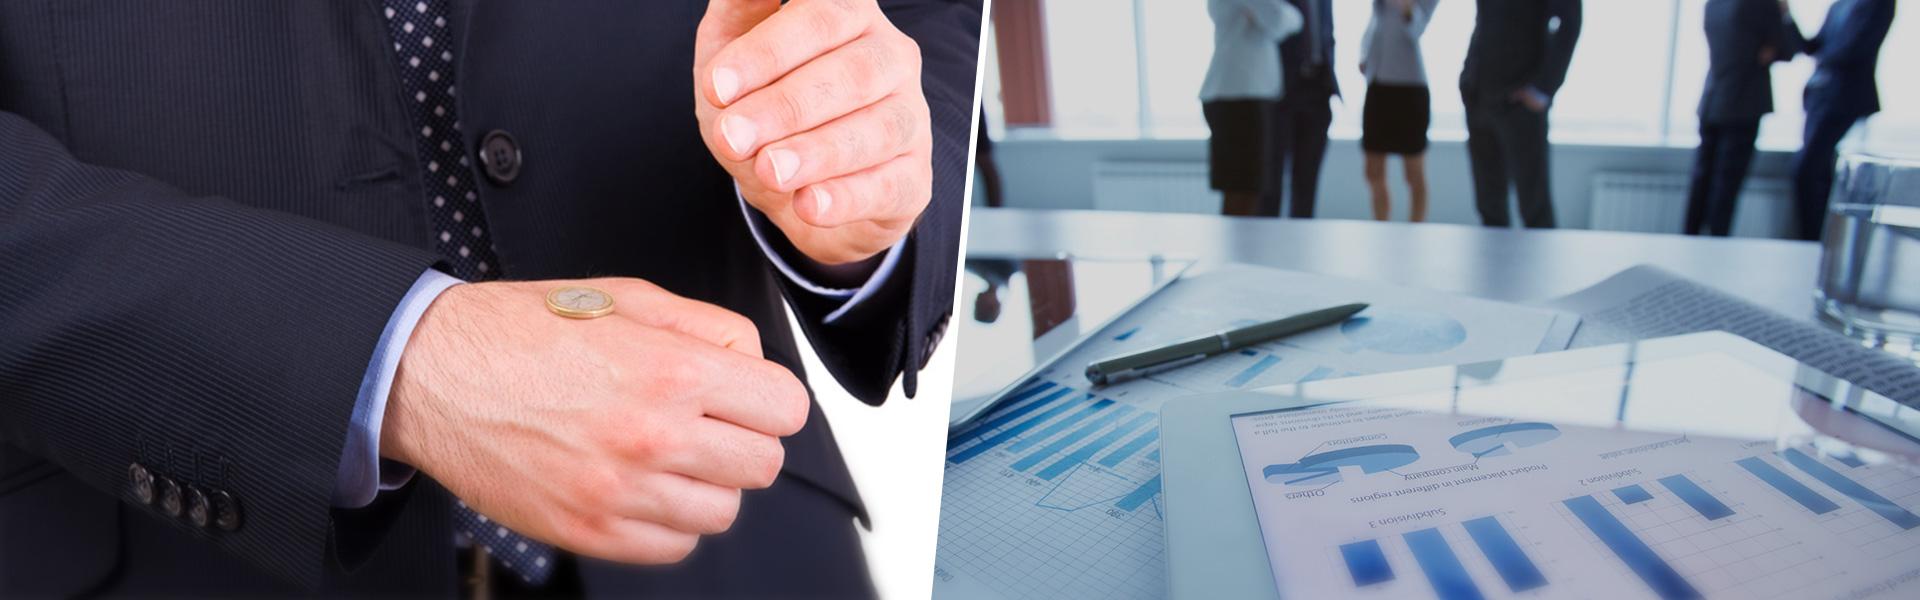 Cabinet d 39 expertise comptable ollivier associ s expert comptable commissaire aux comptes - Cabinet audit et conseil ...